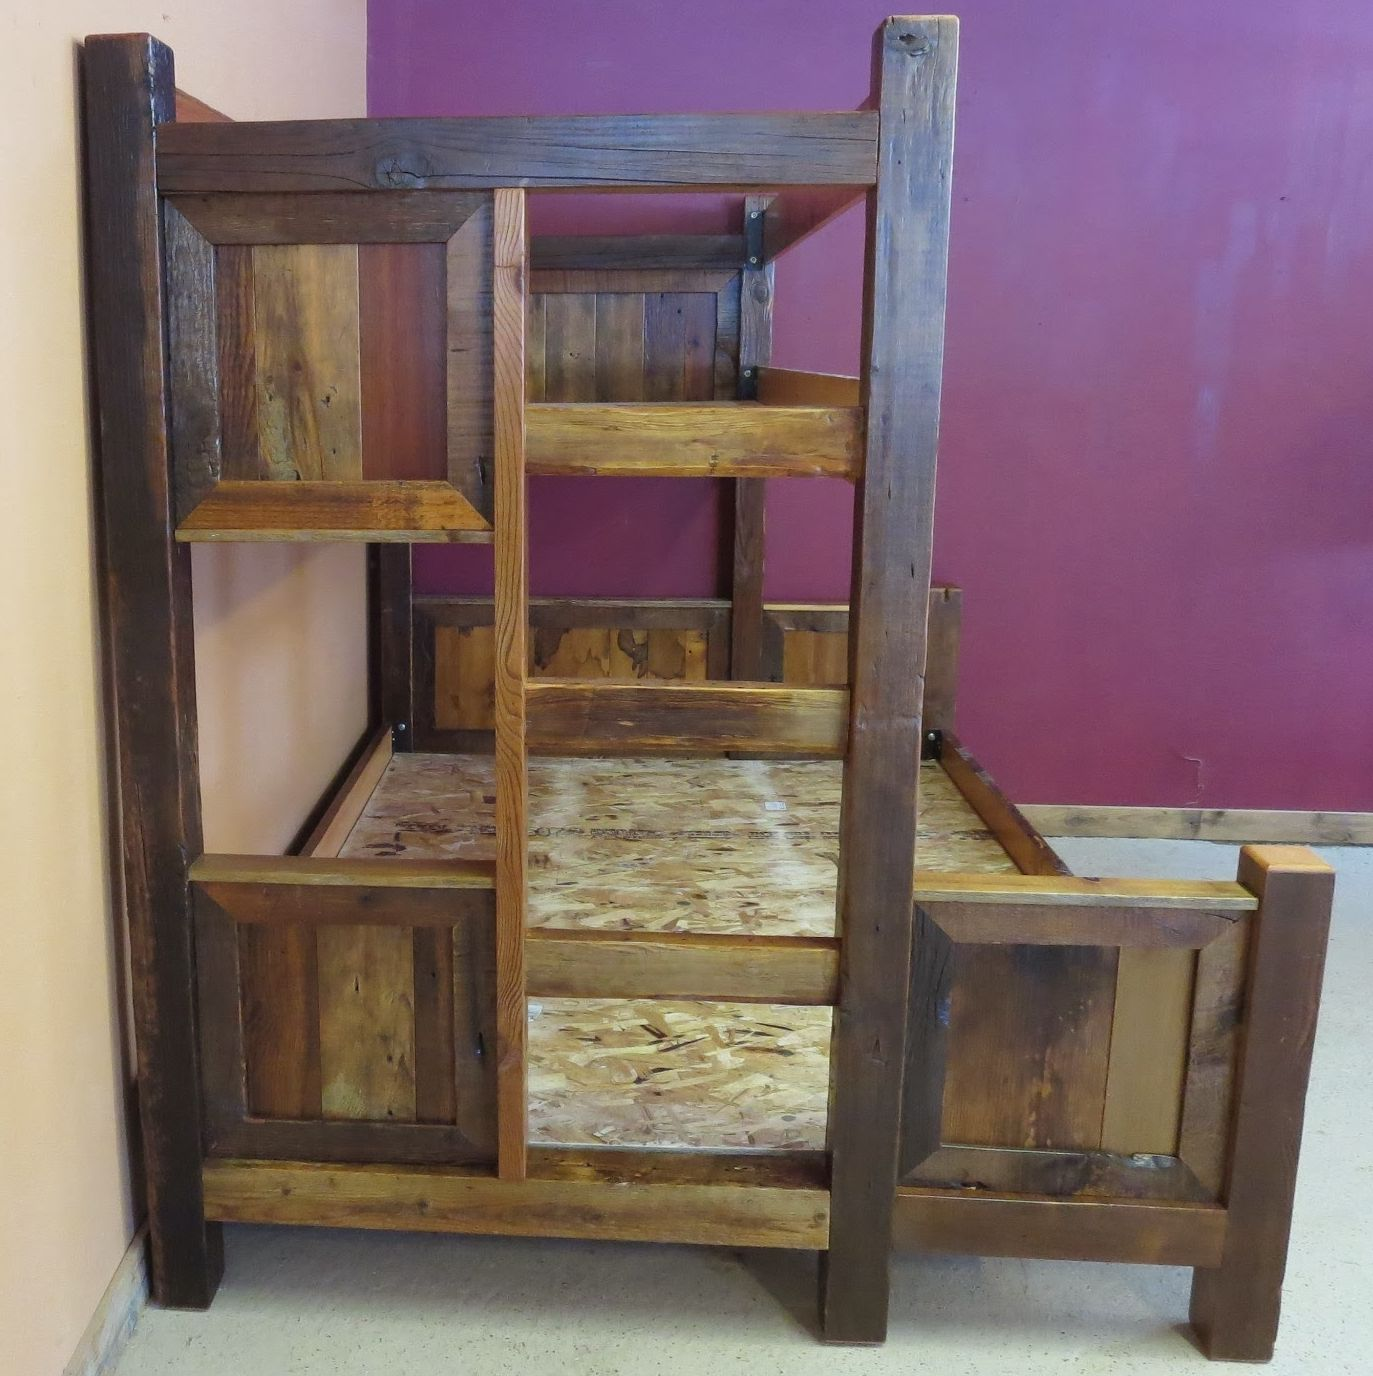 barnwood-bunk-bed-5.jpg